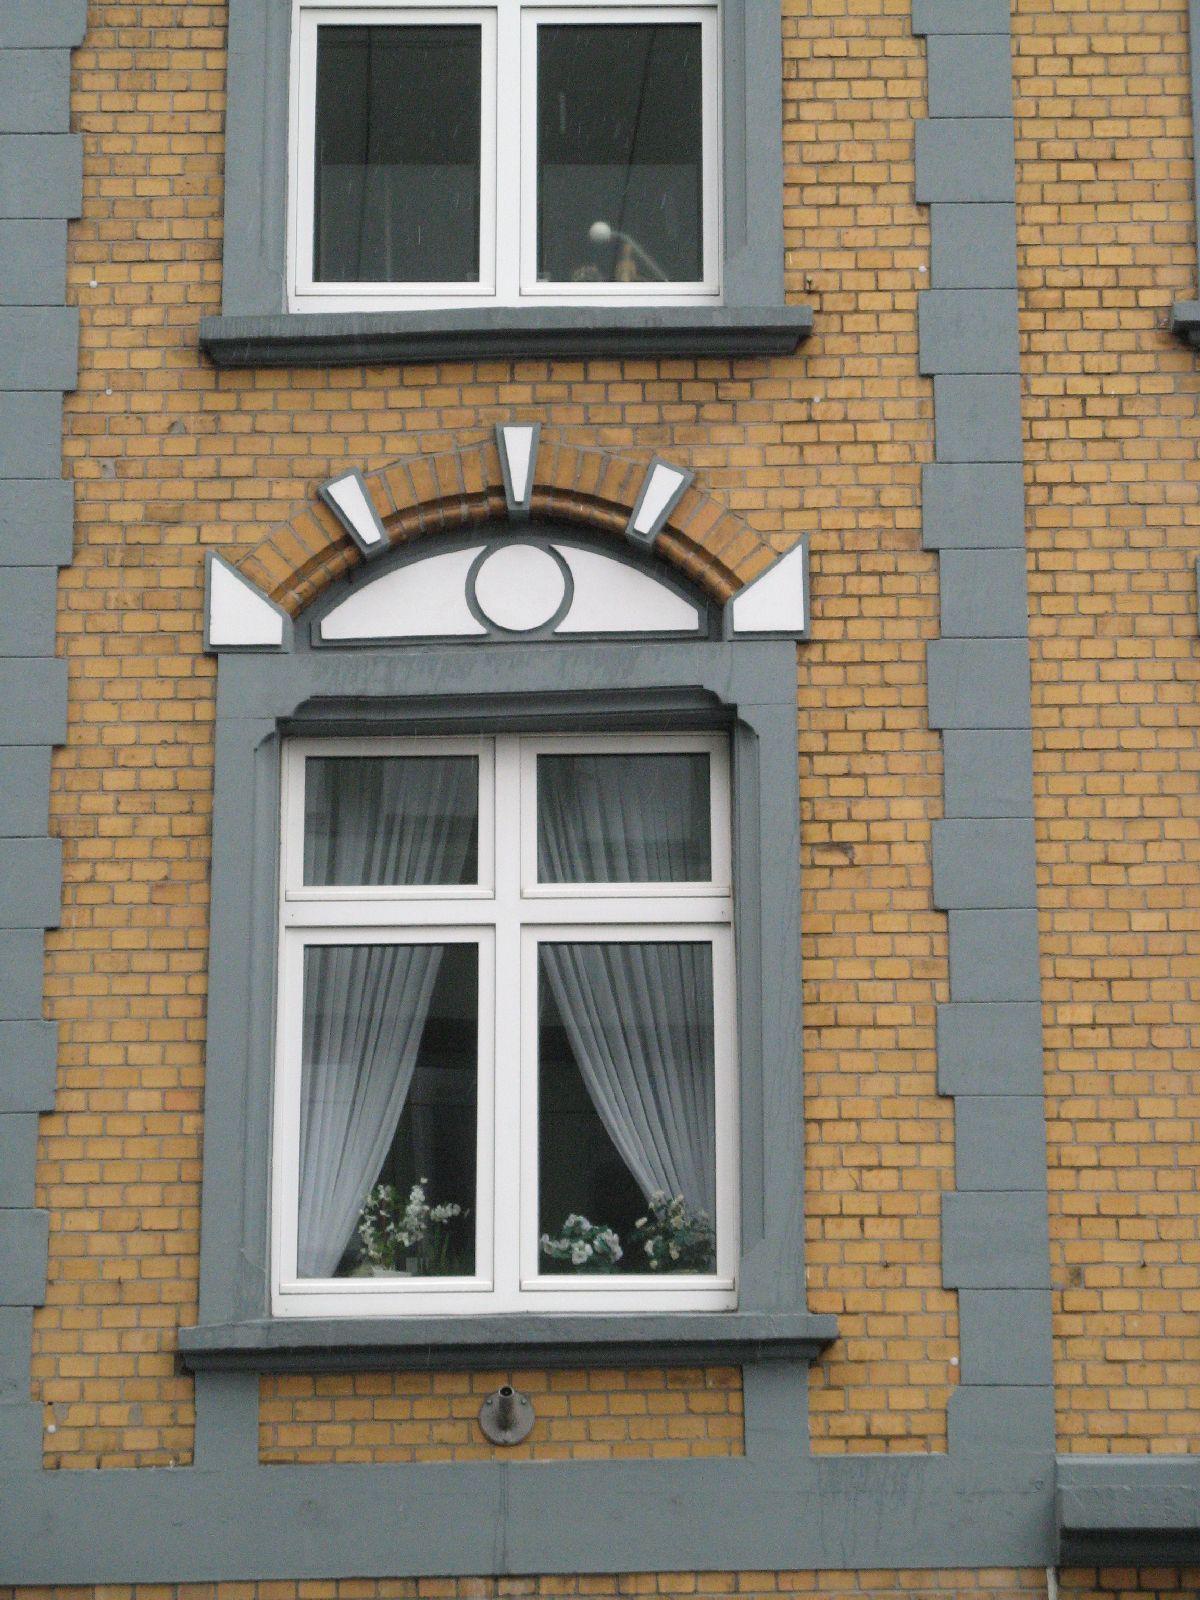 Building_Texture_B_3982